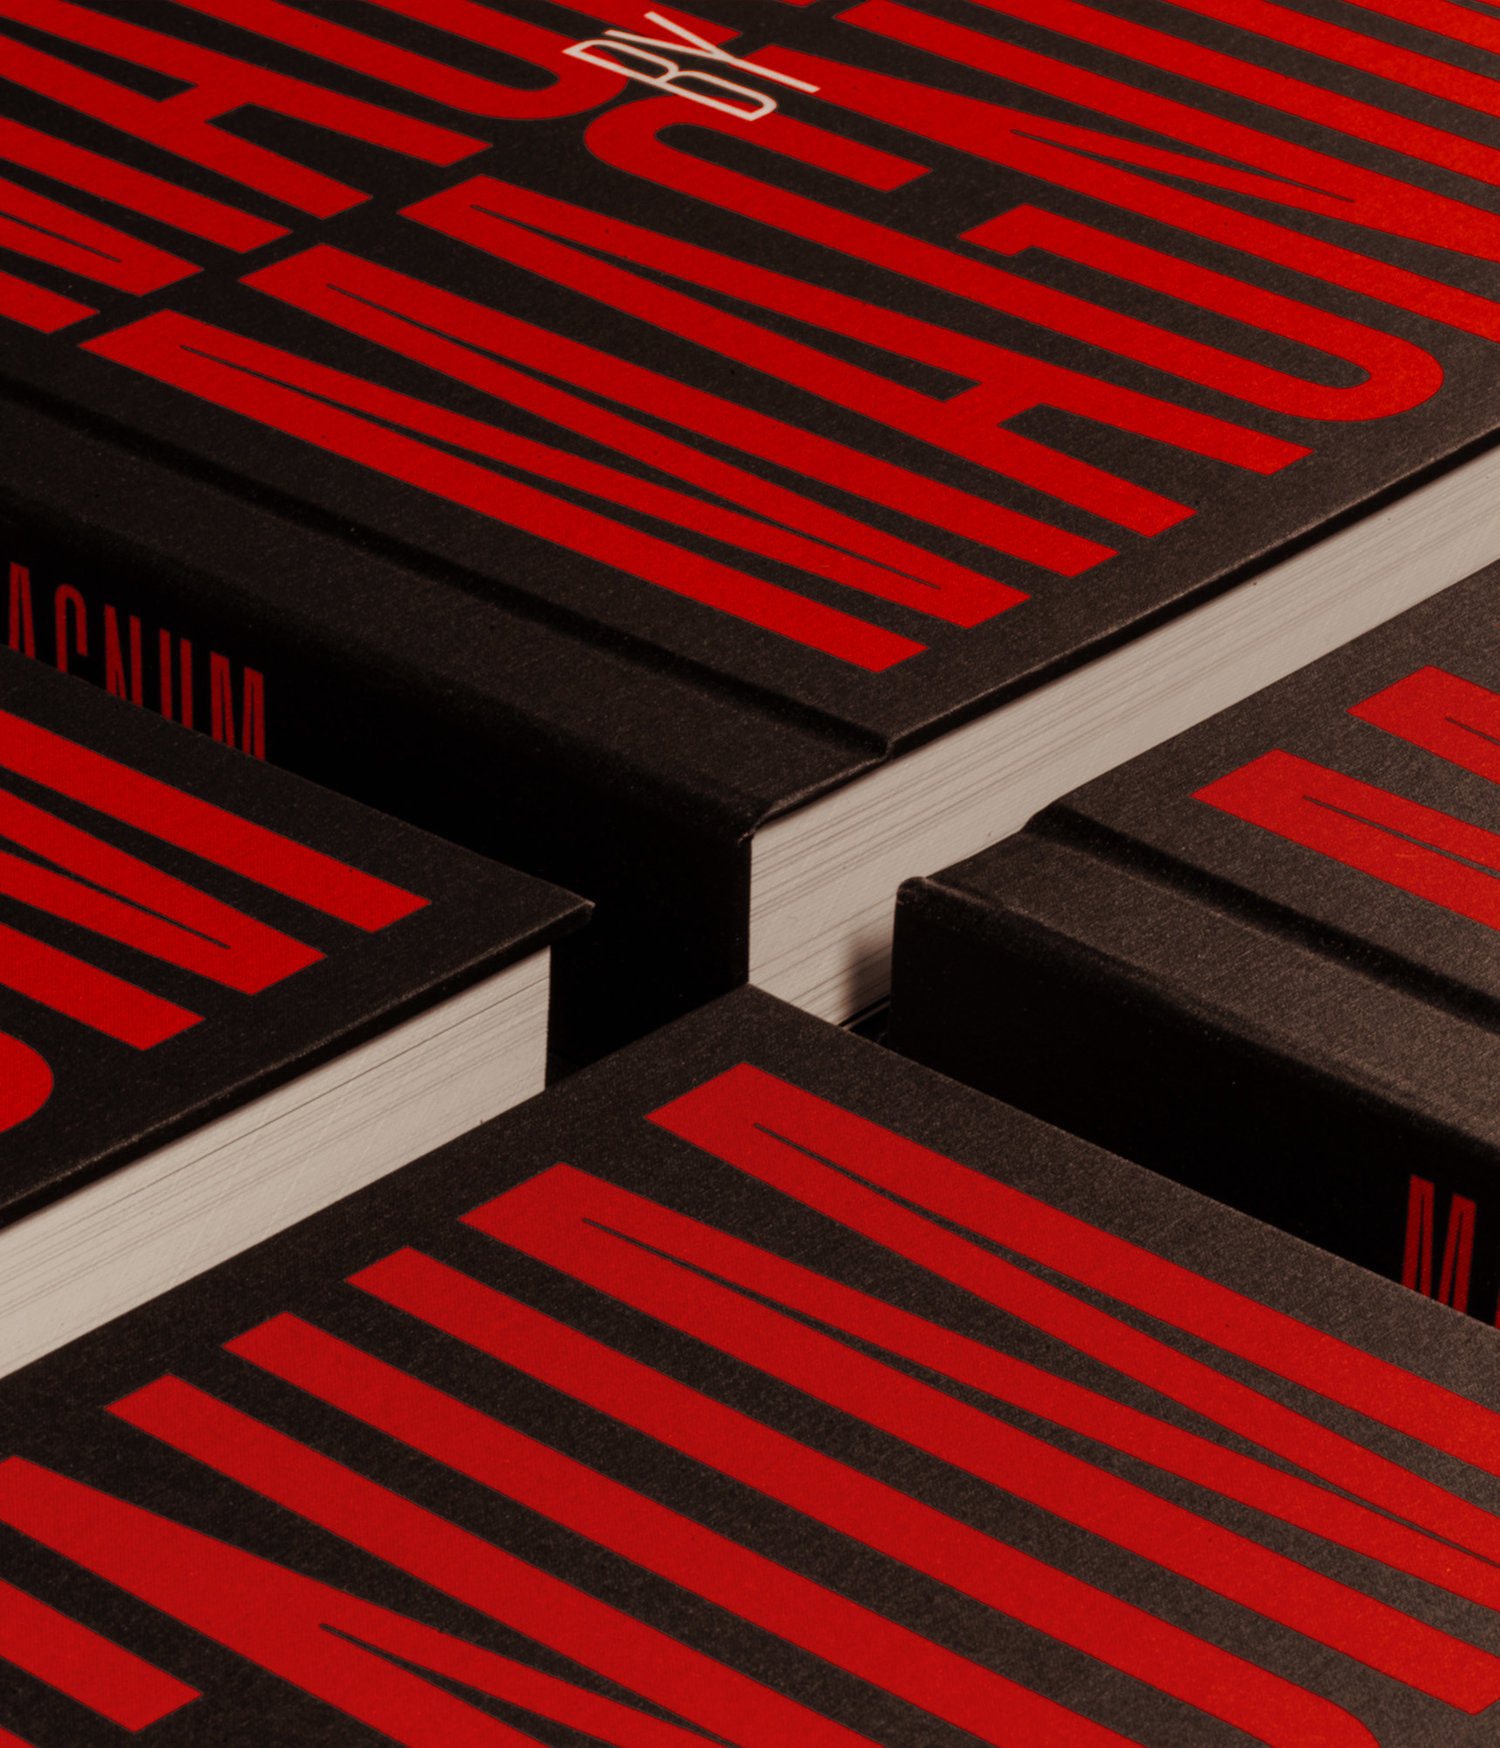 magnum-by-magnum-book17.jpg